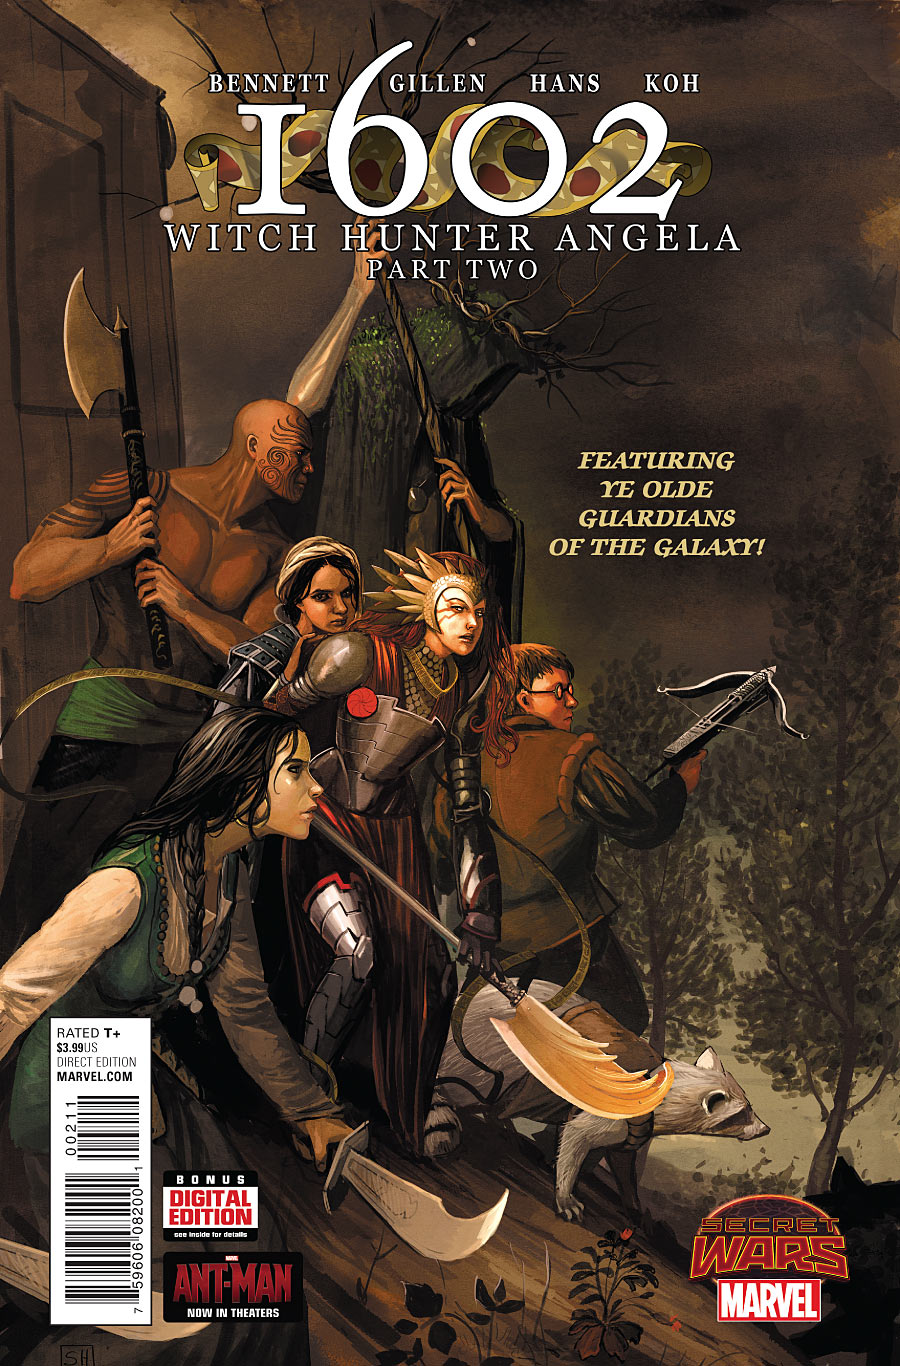 1602 Witch Hunter Angela Vol 1 2 | Marvel Database | FANDOM